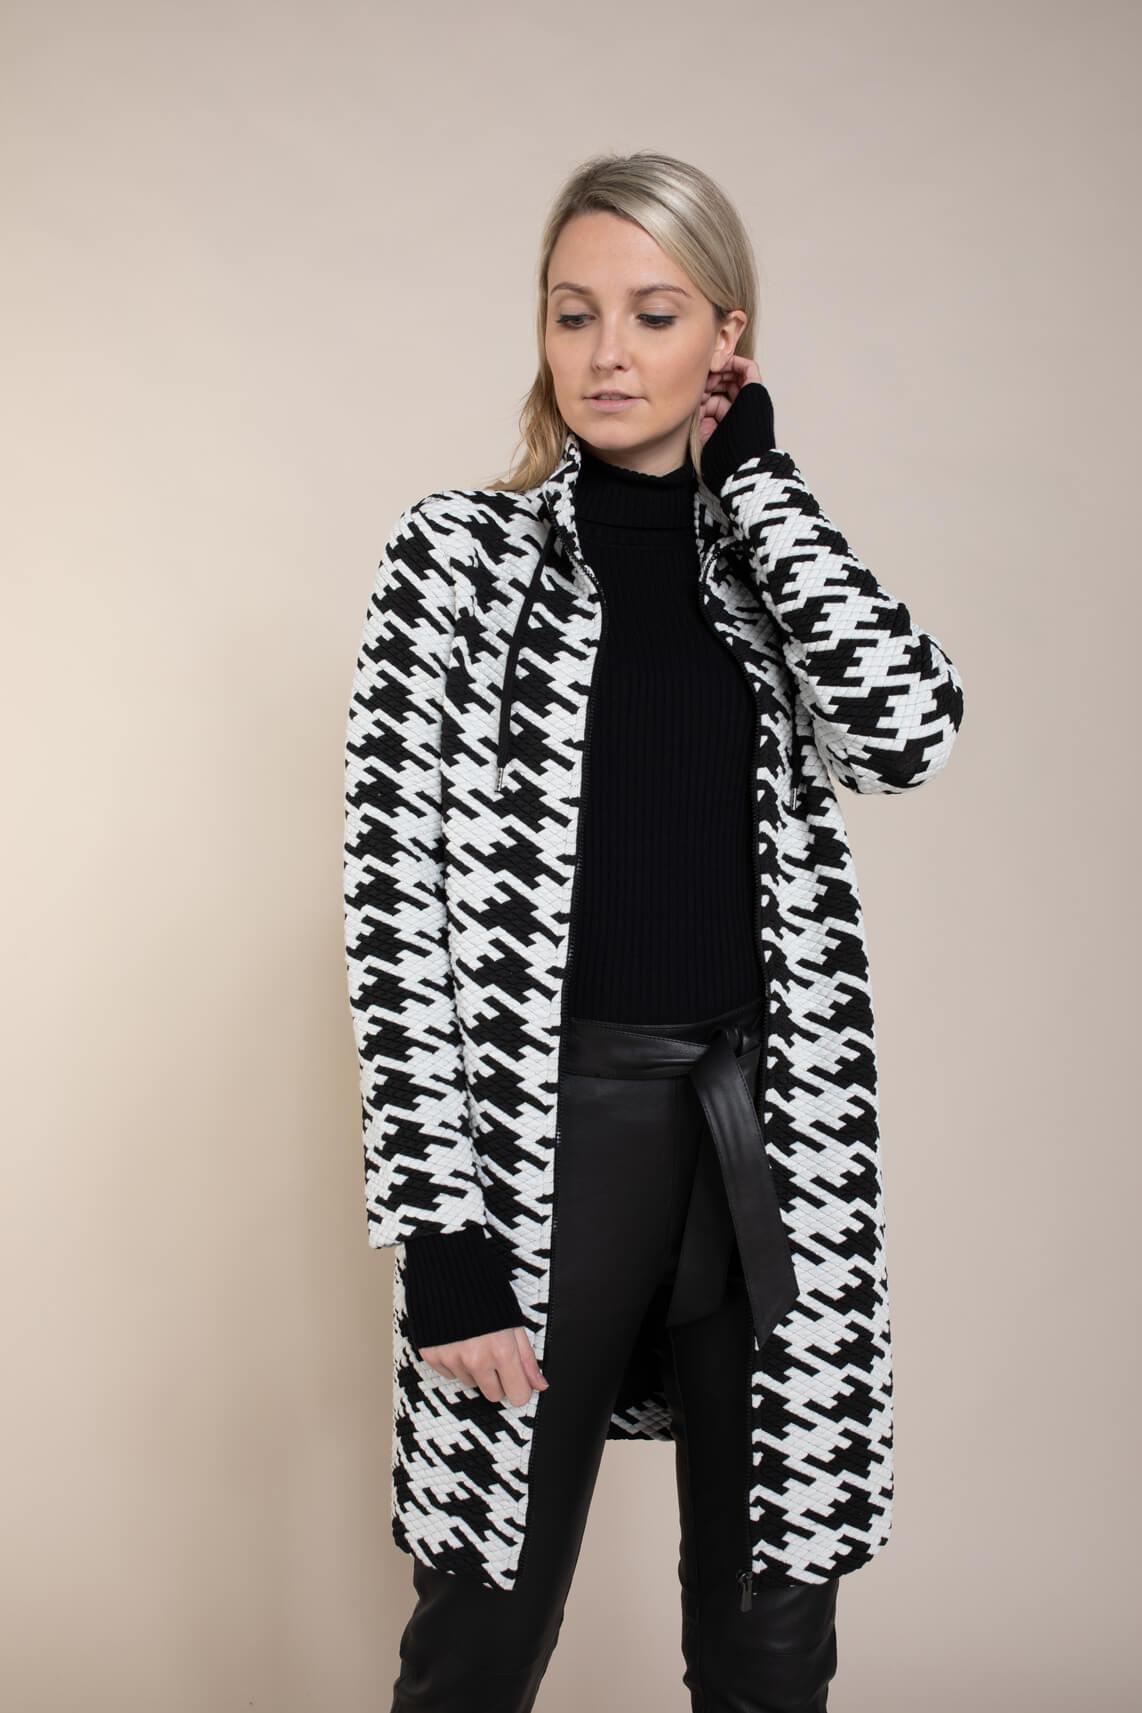 Anna Dames Pied-de-coque vest zwart